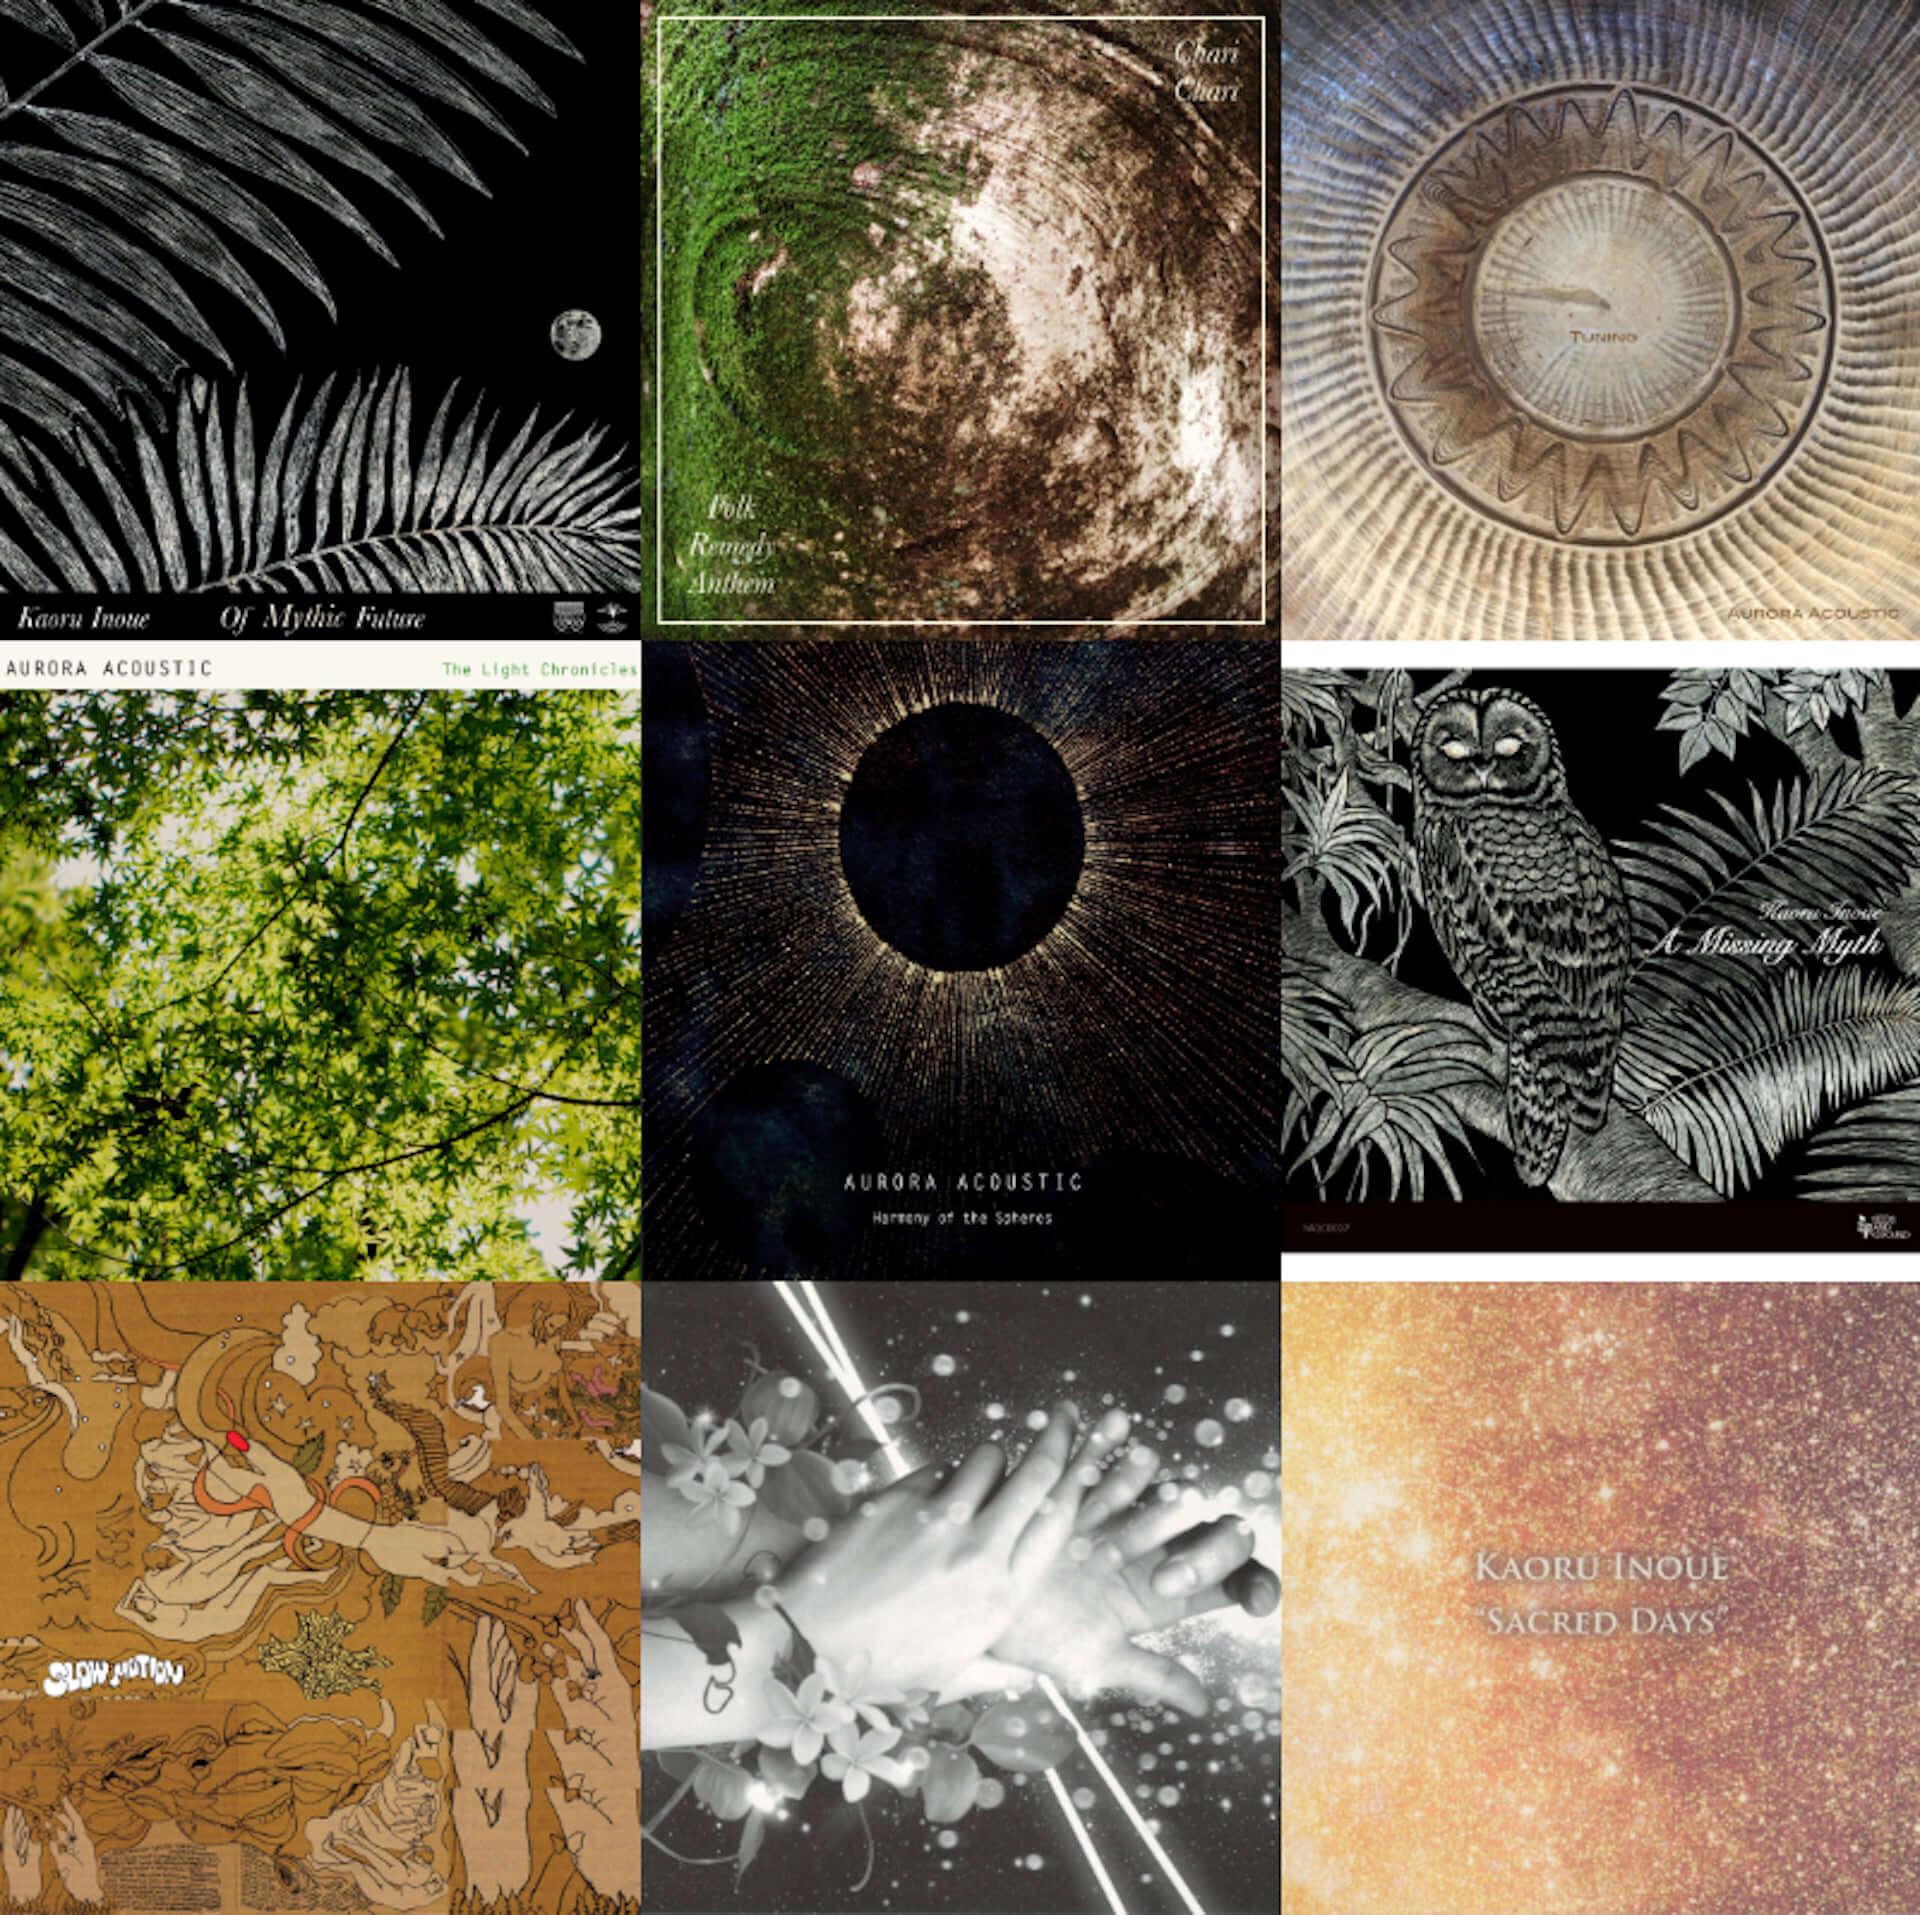 Kaoru Inoue、Chari Chari名義で18年振りのニューアルバム『We hear the last decades dreaming』を発表!自身主宰のレーベル〈Seeds And Ground〉よりデジタル配信もスタート music200618_kaoruinoue_2-1920x1915